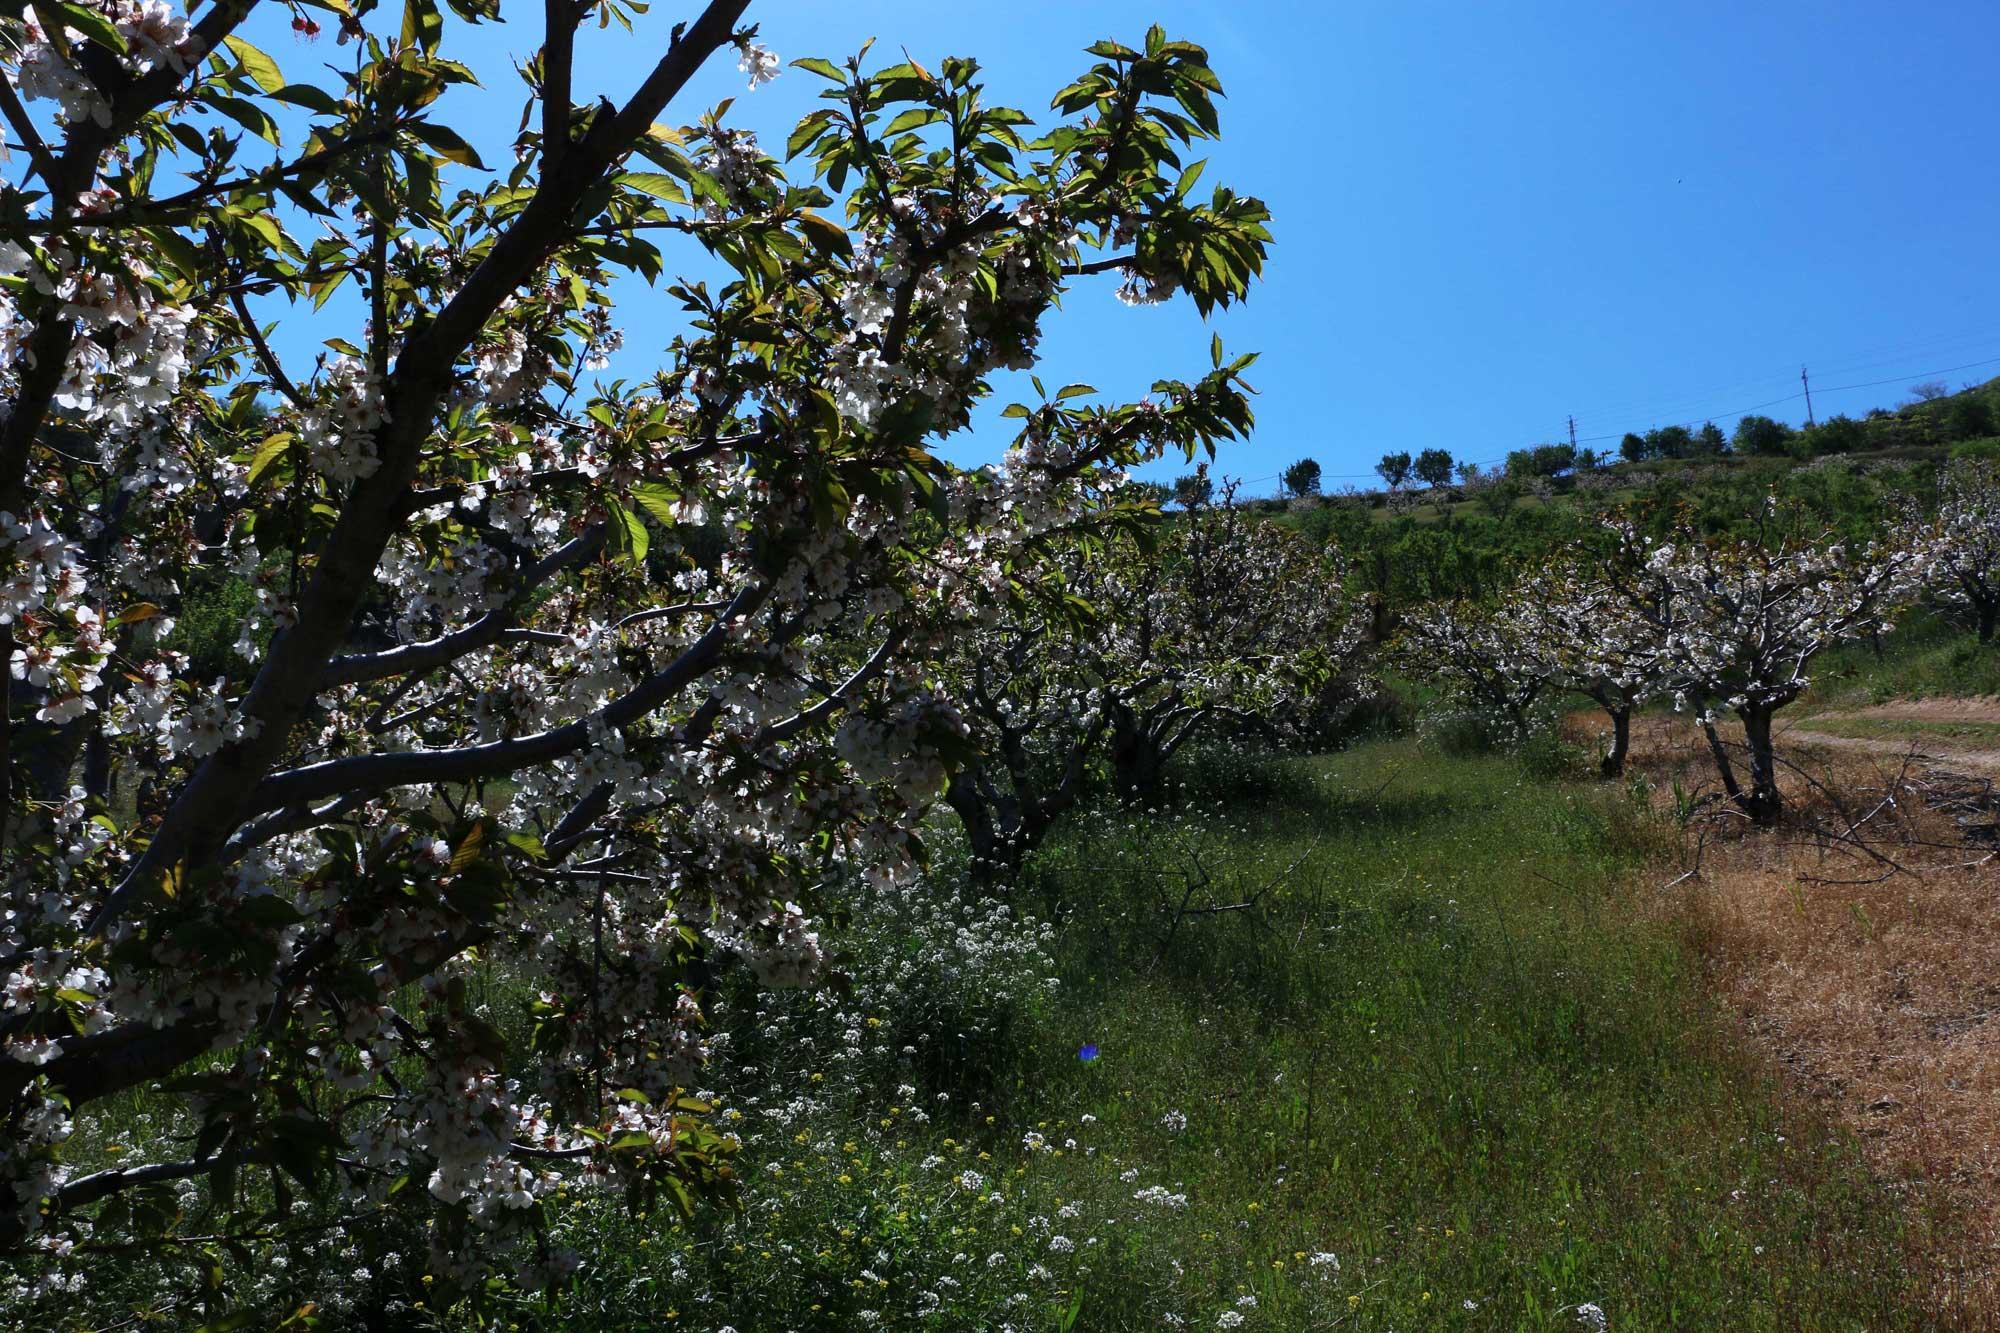 Nabi Alya's agricultural heritage